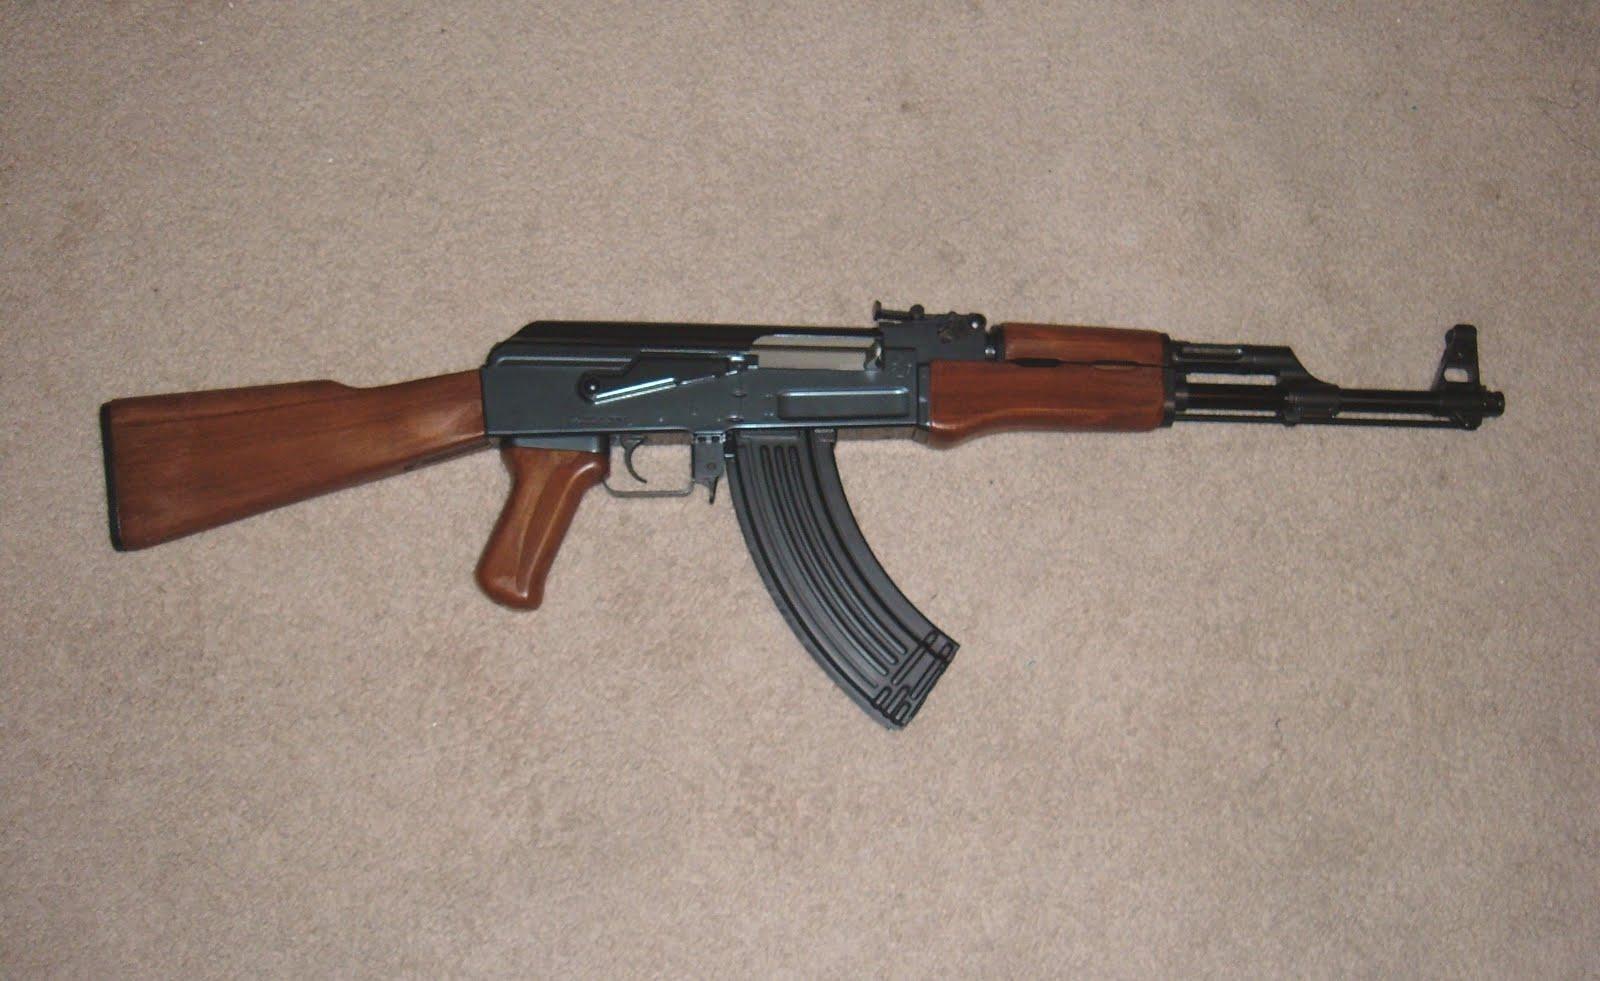 http://4.bp.blogspot.com/-sgYkQ02lC_M/Tag1R9h965I/AAAAAAAAAAo/vu6slcCyPA4/s1600/Airsoft_AK-47.JPG